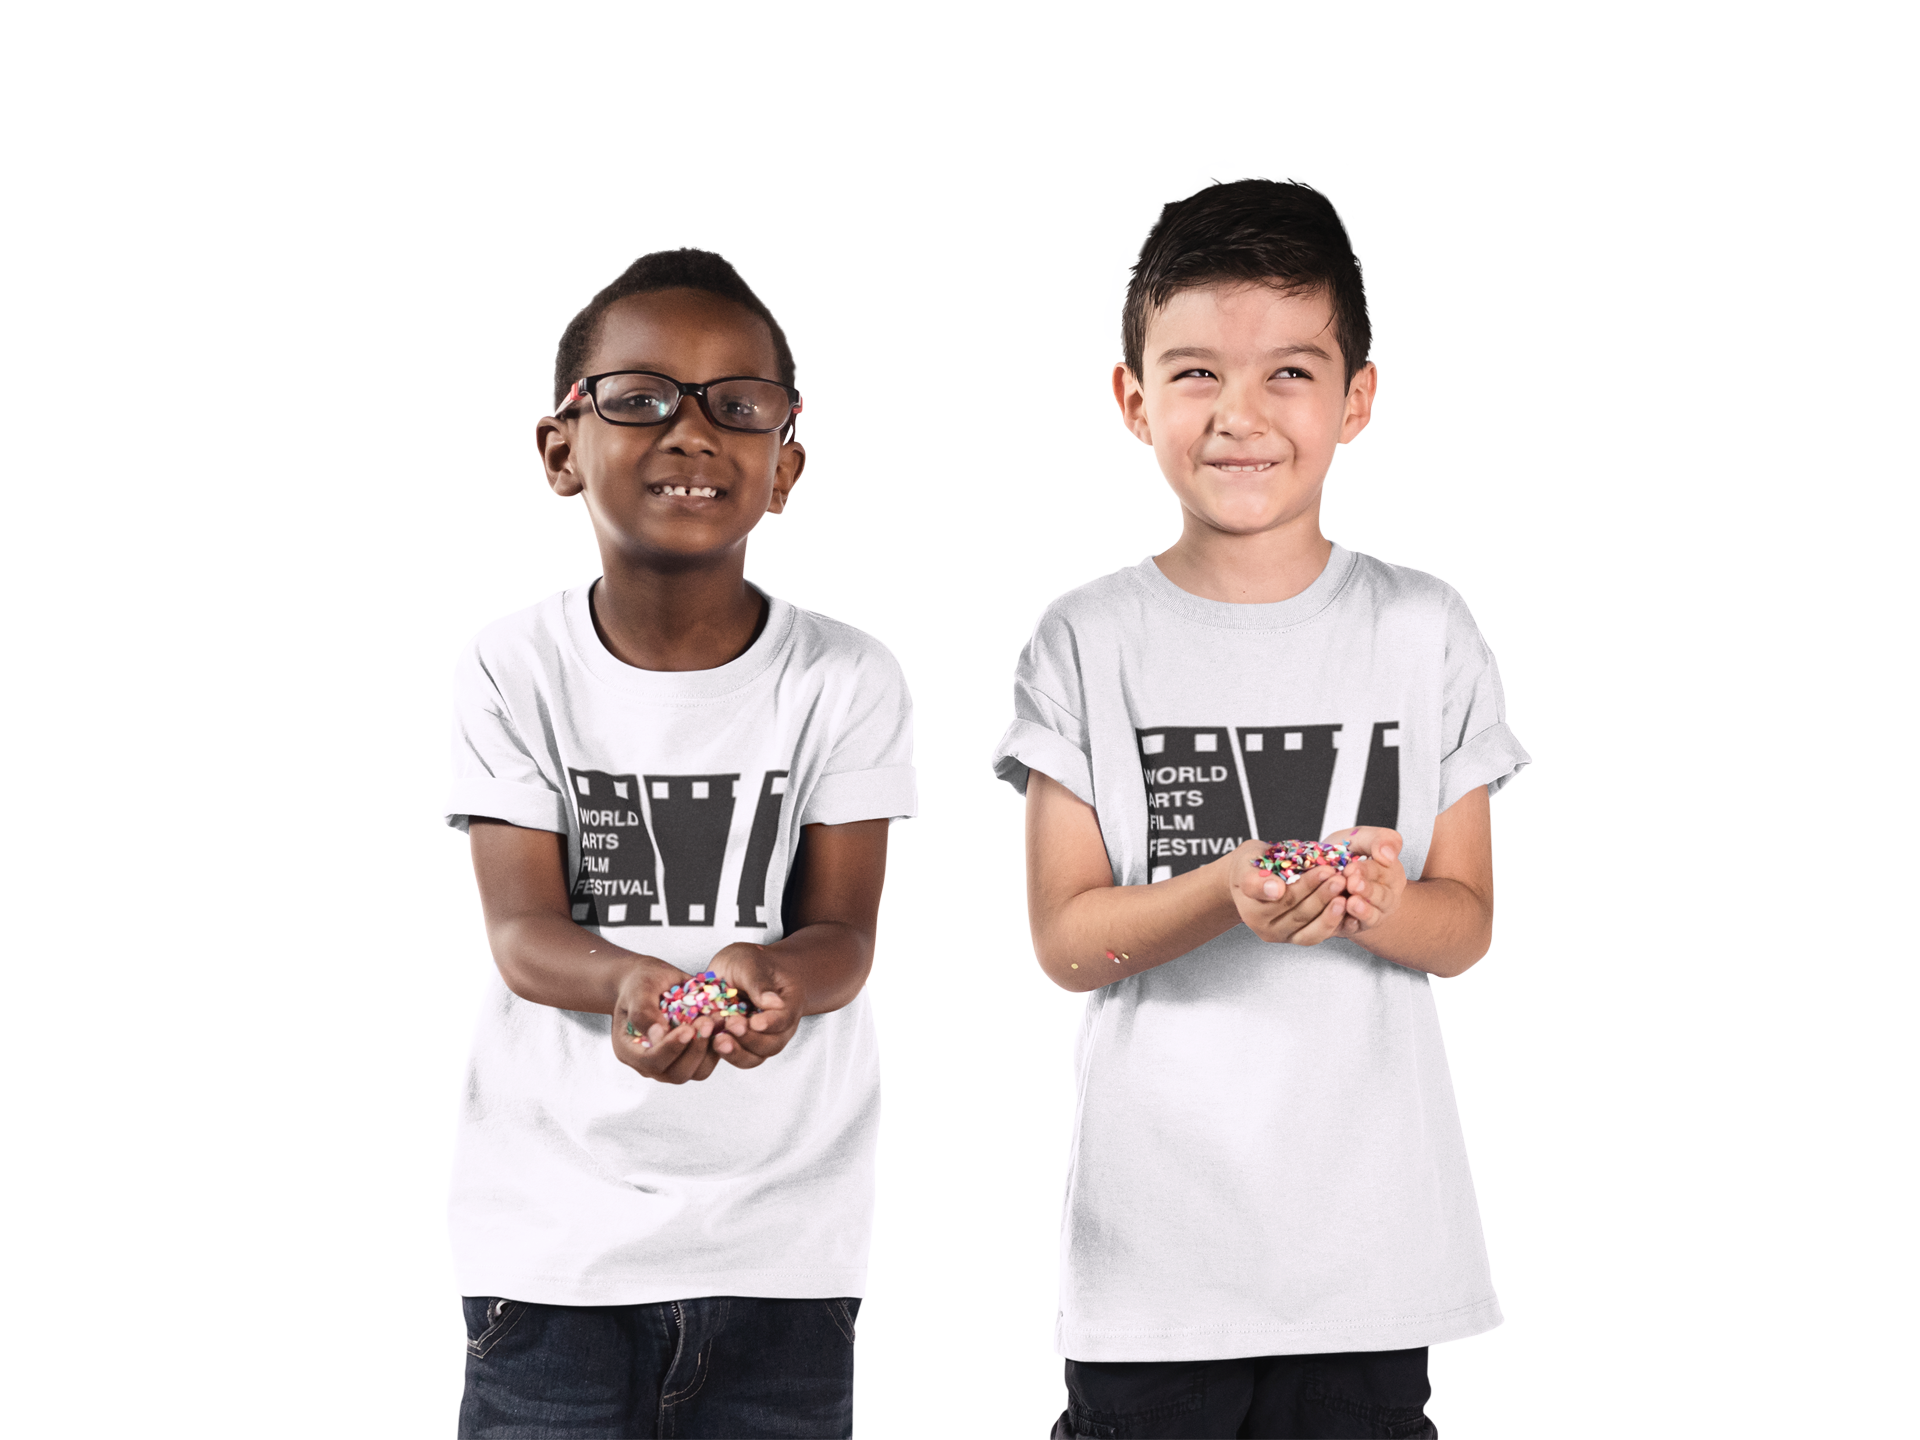 waf4 teespring kids 2